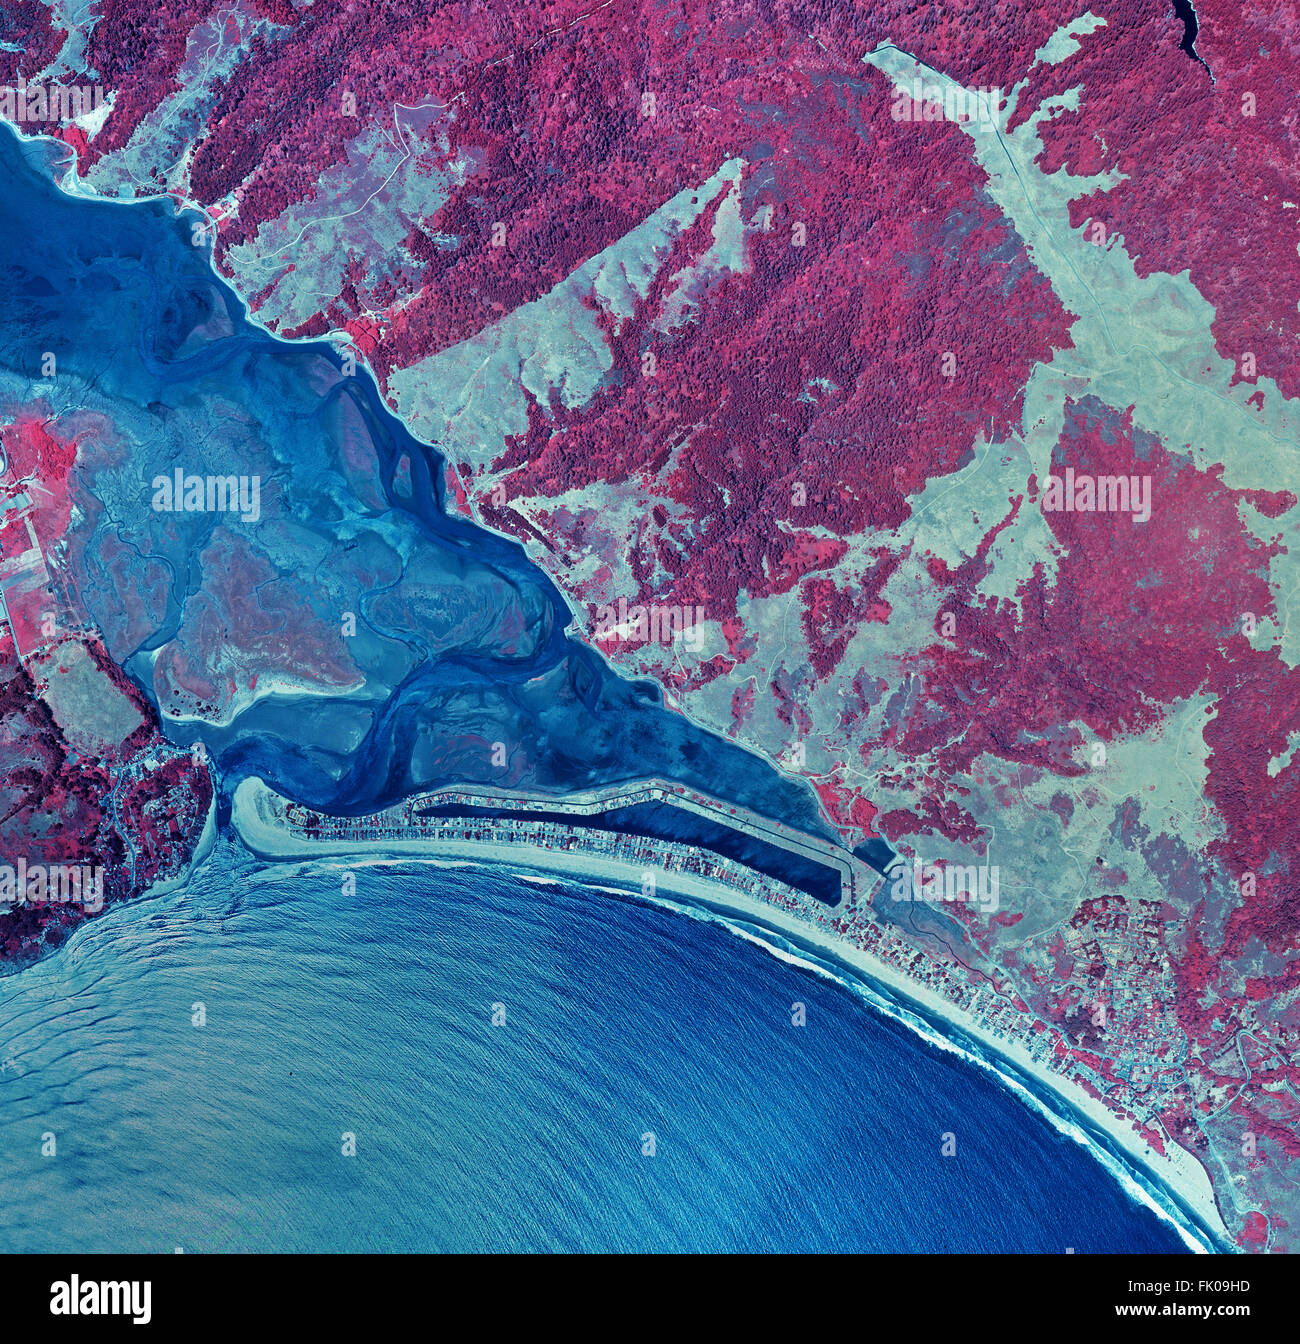 historical infrared aerial photograph of of Stinson Beach, Bolinas and the Bolinas Bay and Bolinas Lagoon, Marin - Stock Image